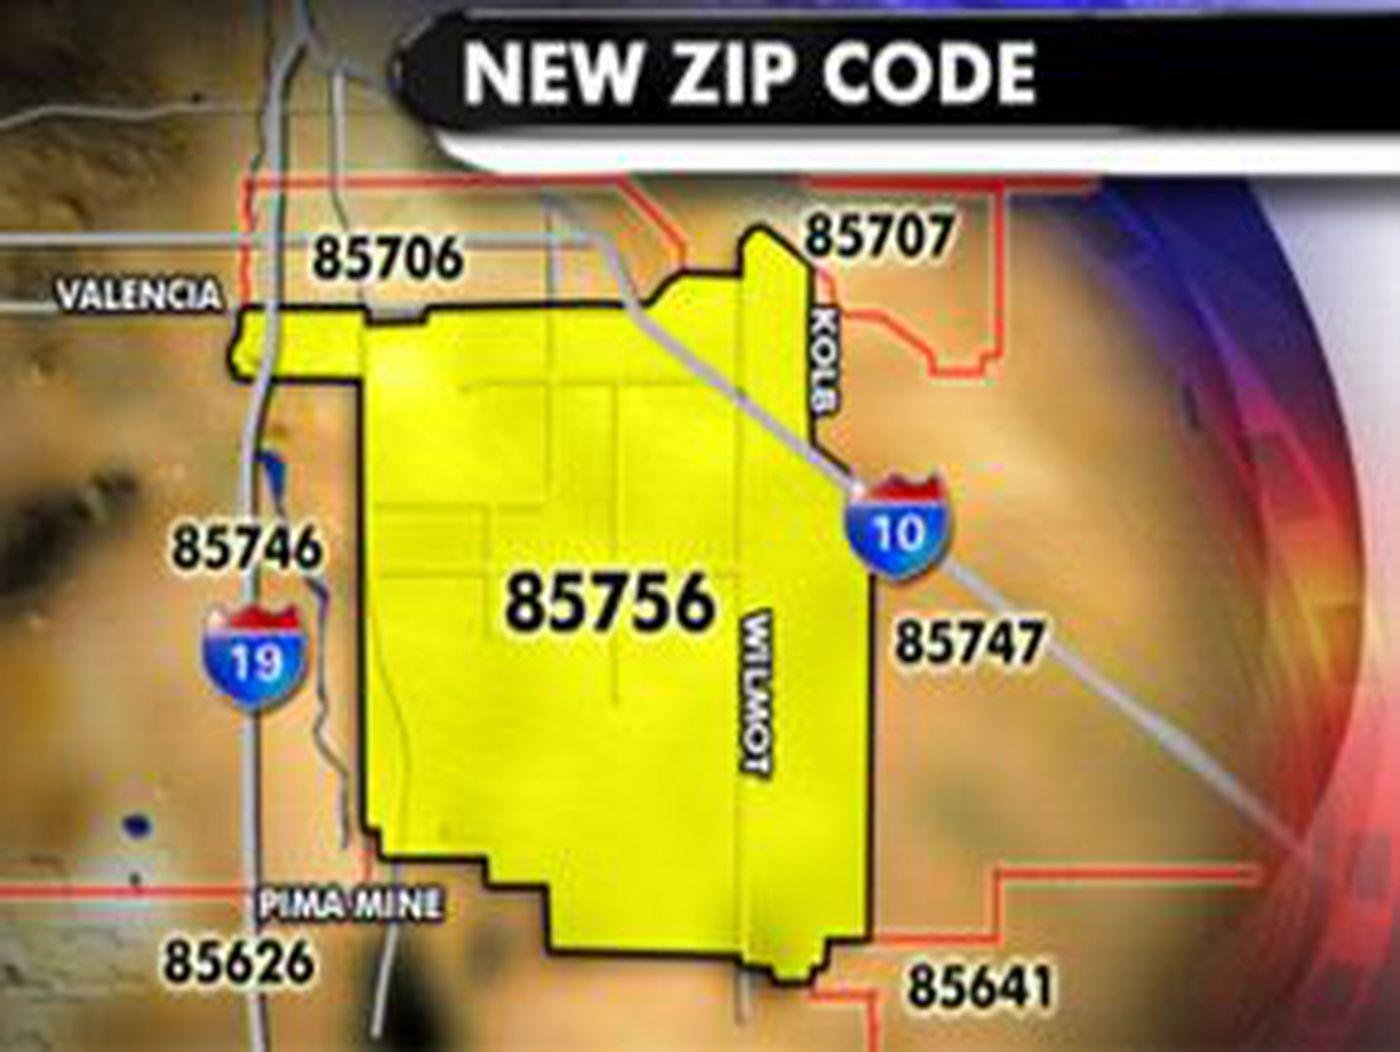 New Zip Code For SE Tucson Zip Code Map Tucson on tucson street map street names, tucson weather, tucson state map, tucson az on the map, tucson neighborhood map, tucson schools map, tucson usa map, tucson az suburbs map, national city zip codes map, tucson city map, tucson arizona, oro valley parks map, tucson az x, tucson city streets, tucson area topographic maps, oro valley zip codes map, tucson region map, tucson postal code map, tucson demographics, tucson aerial maps,